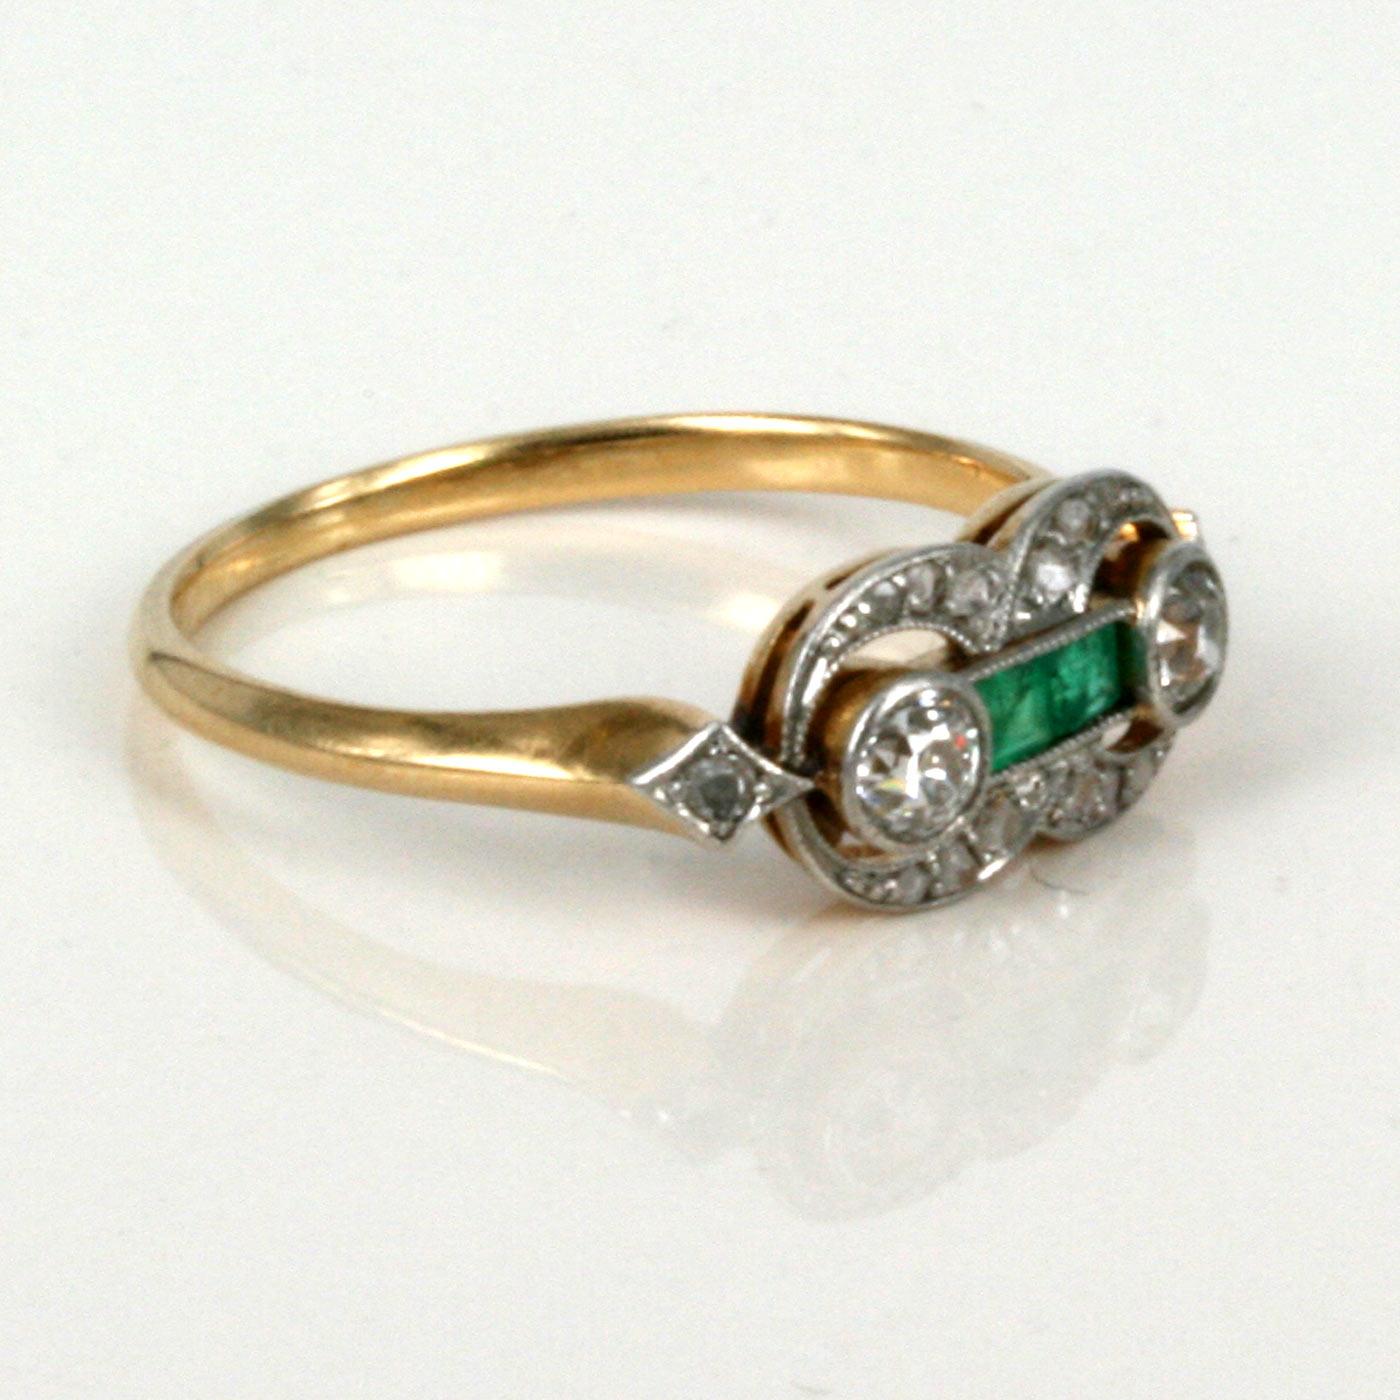 Vintage Art Deco Emerald Rings